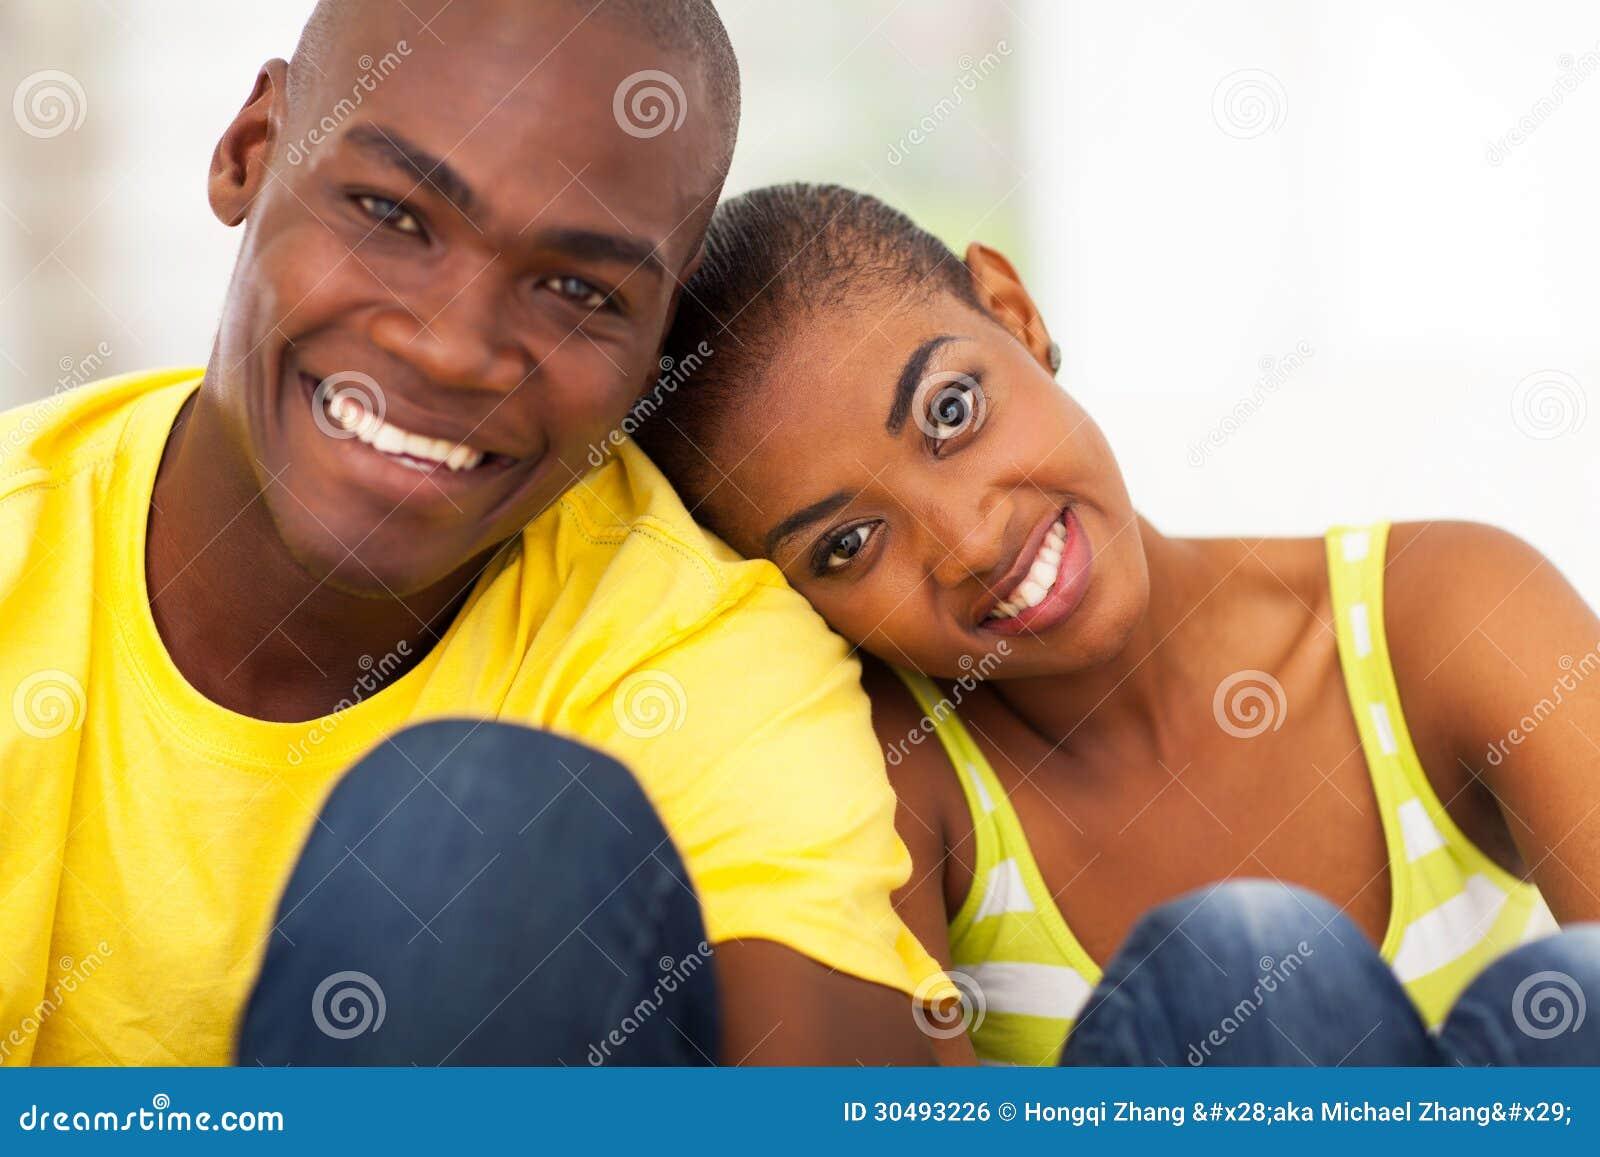 Cute Black Couple Royalty Free Stock Image Image 30493226